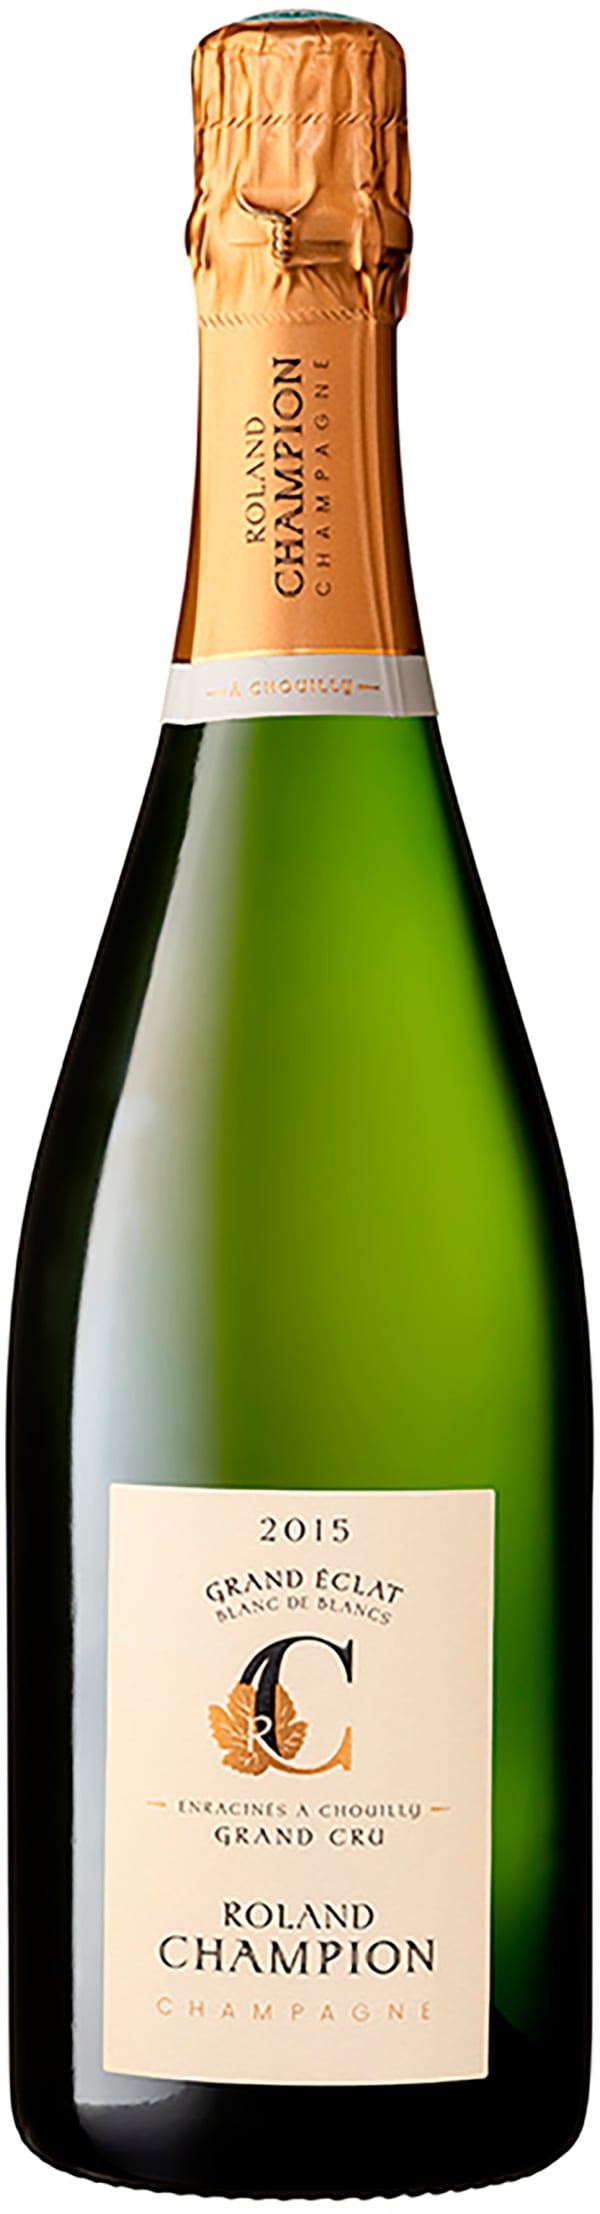 Roland Champion Grand Cru Blanc De Blancs Champagne Brut 2008